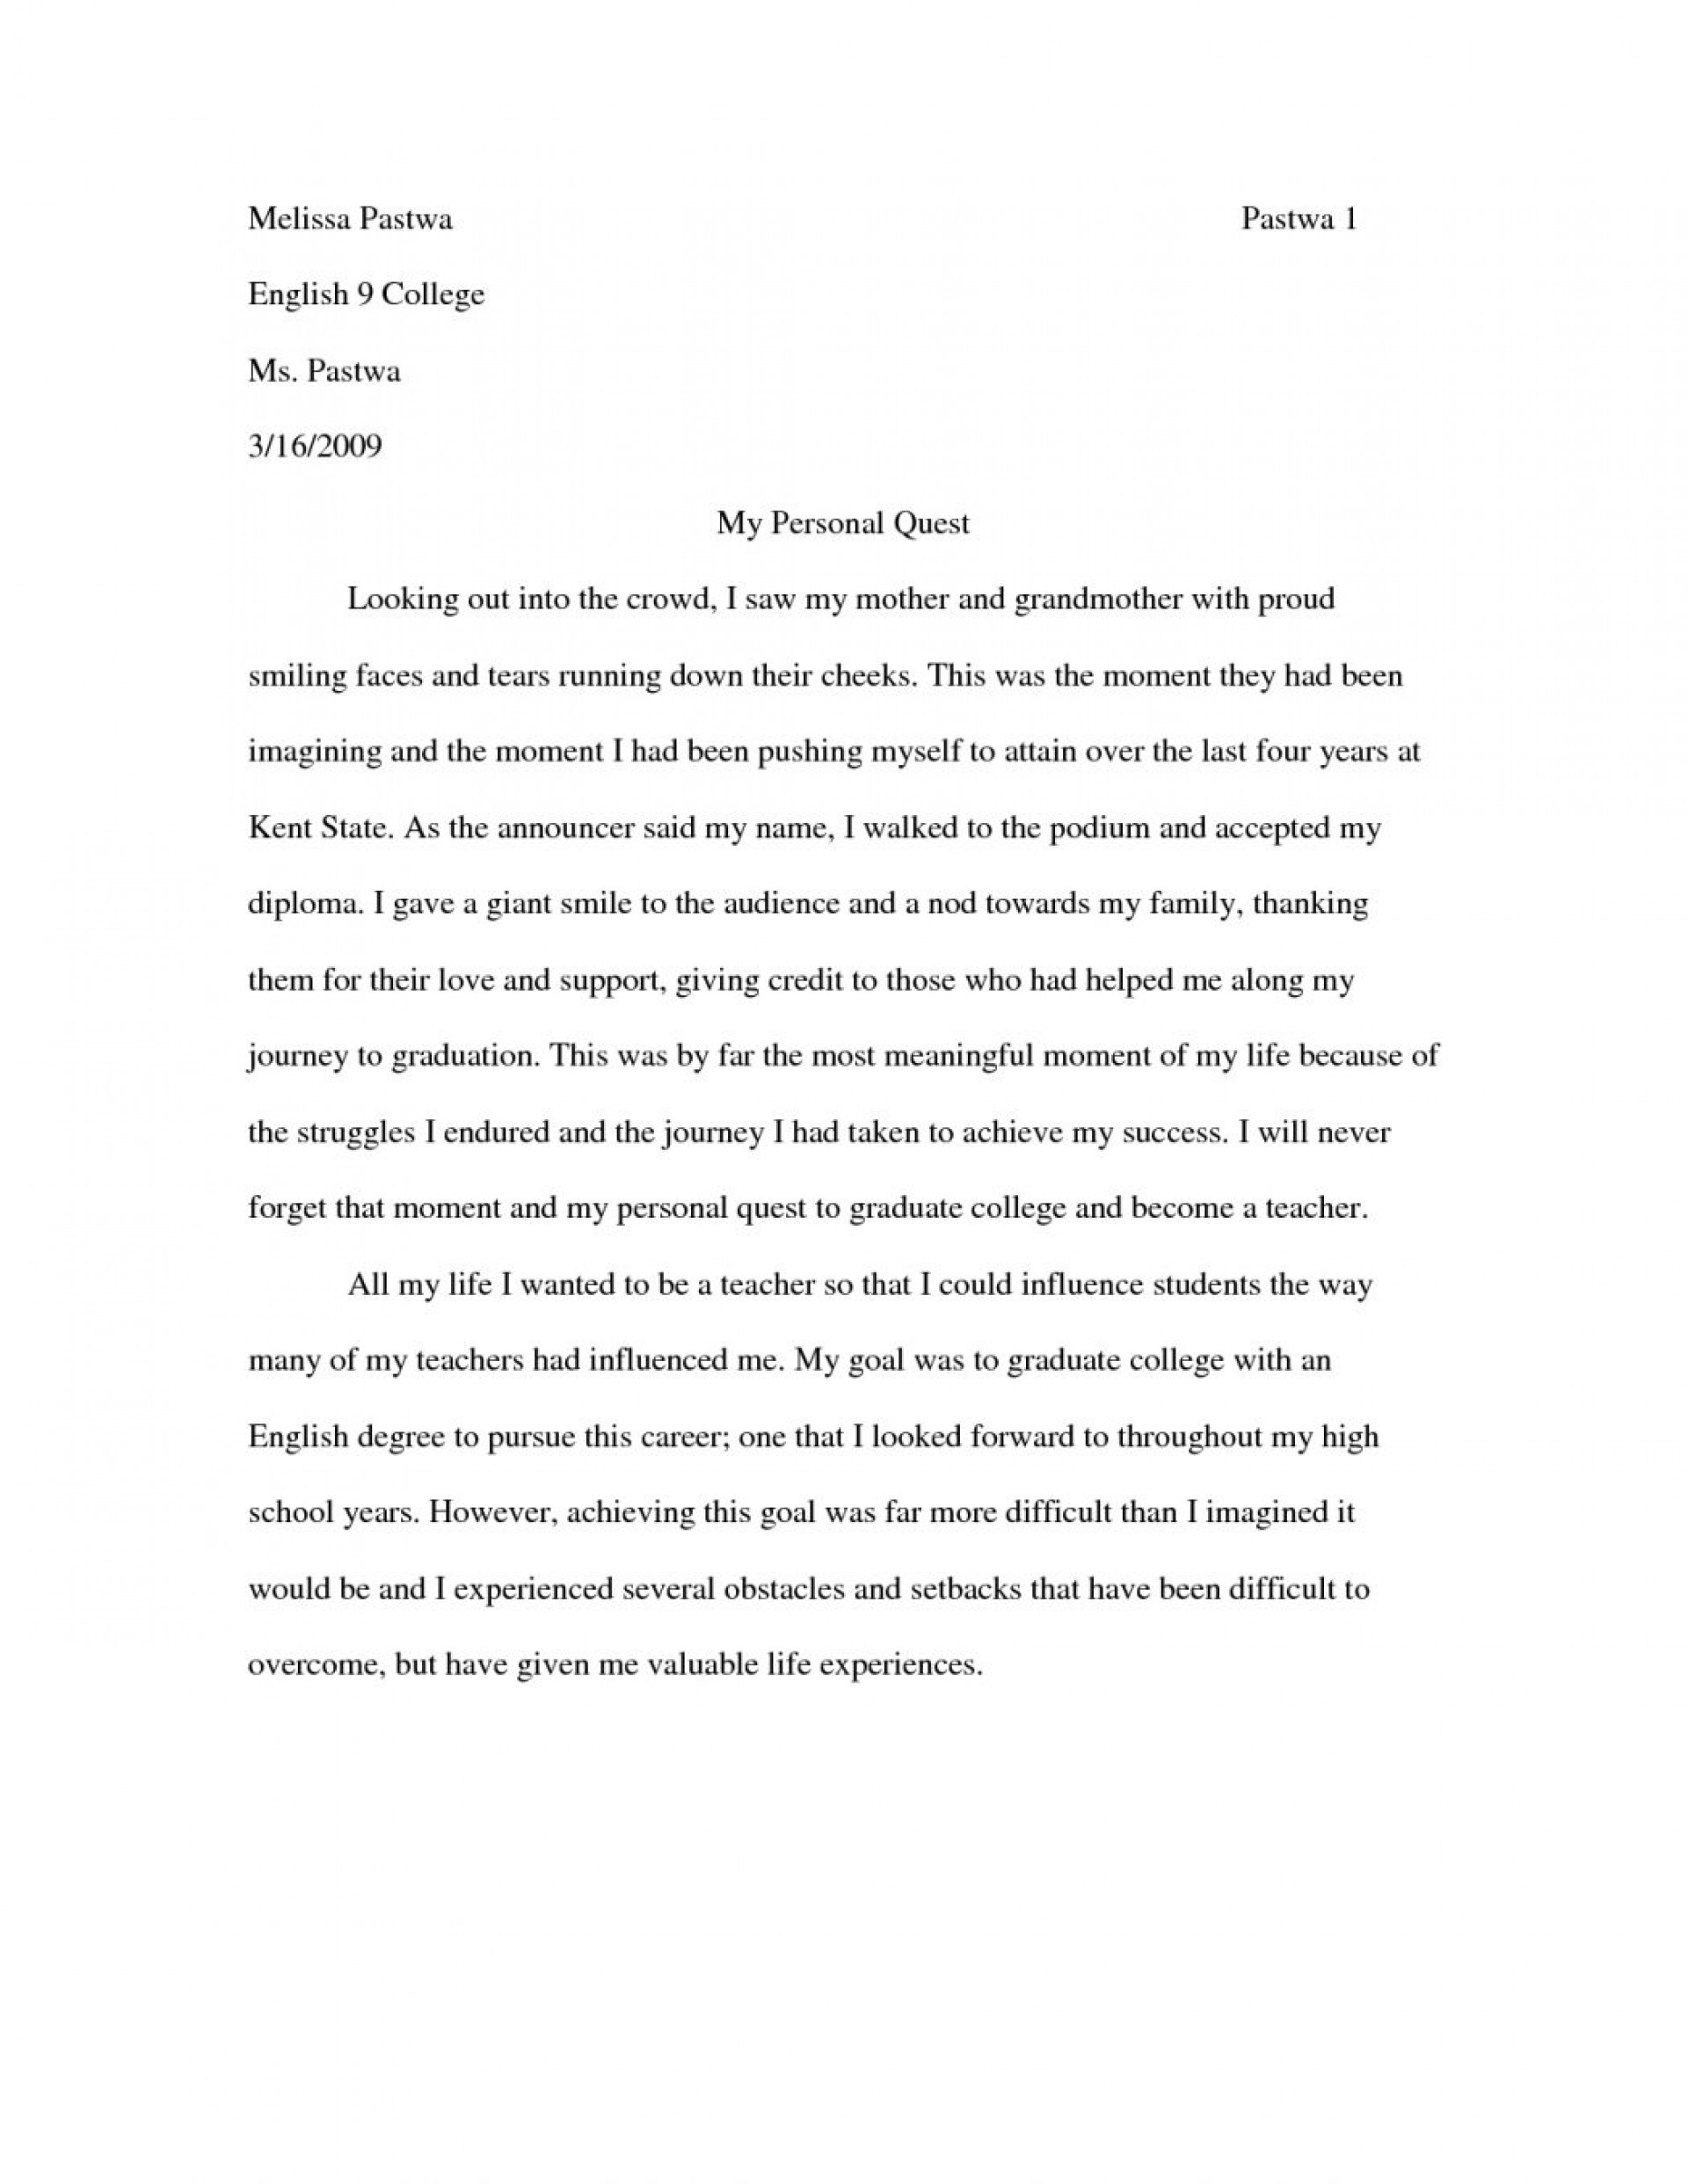 005 College Essays Printables Corner Harvard Prompts Ecza Solinf Co Best Ucf Prompt Pomona Mit Uc Texas Amherst Boston 1048x1356 Archaicawful Essay 2017 1920